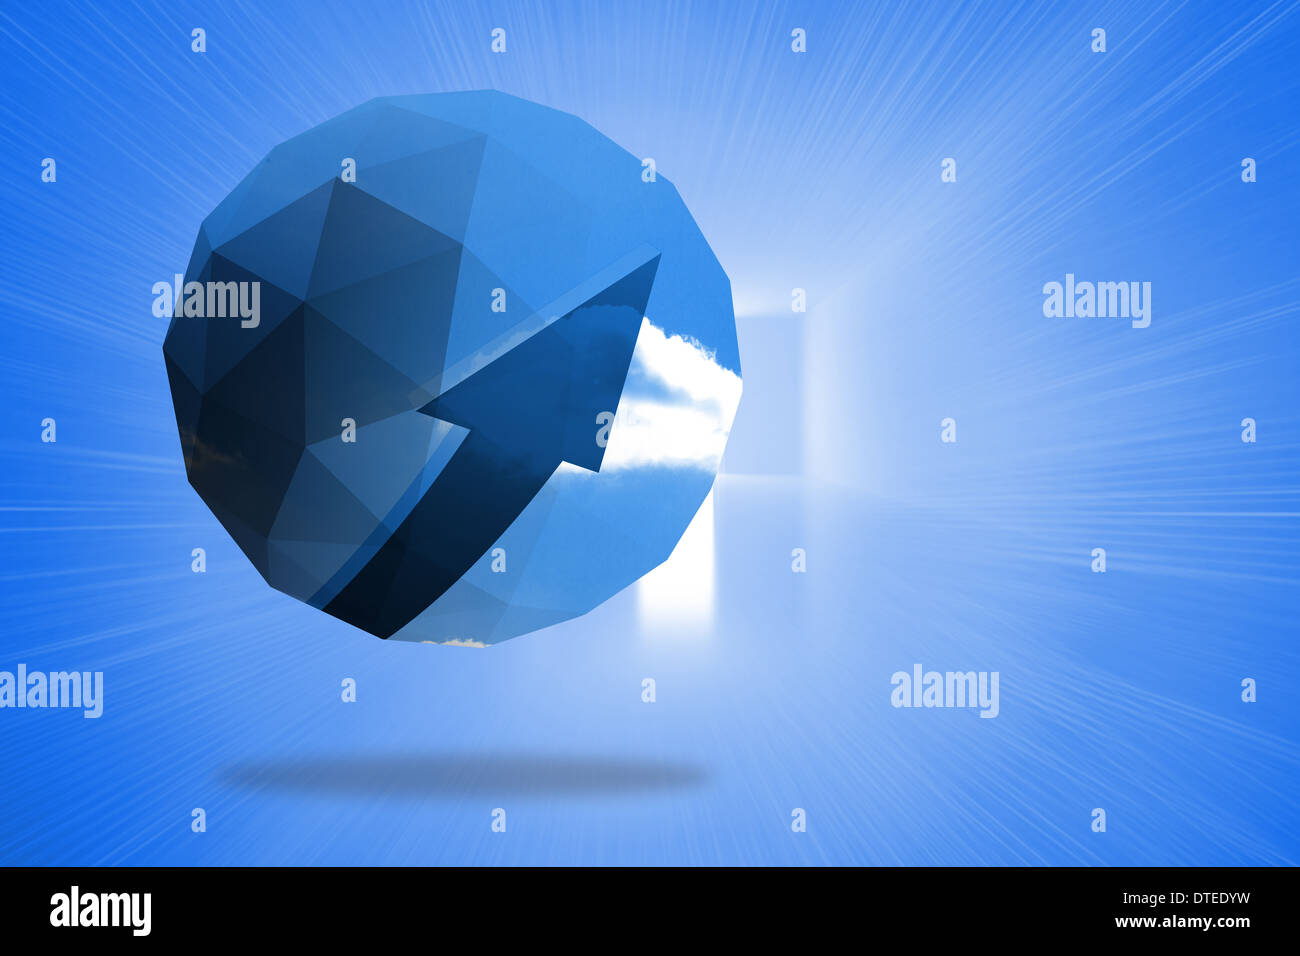 Imagen compuesta de flecha azul en pantalla abstracto Imagen De Stock